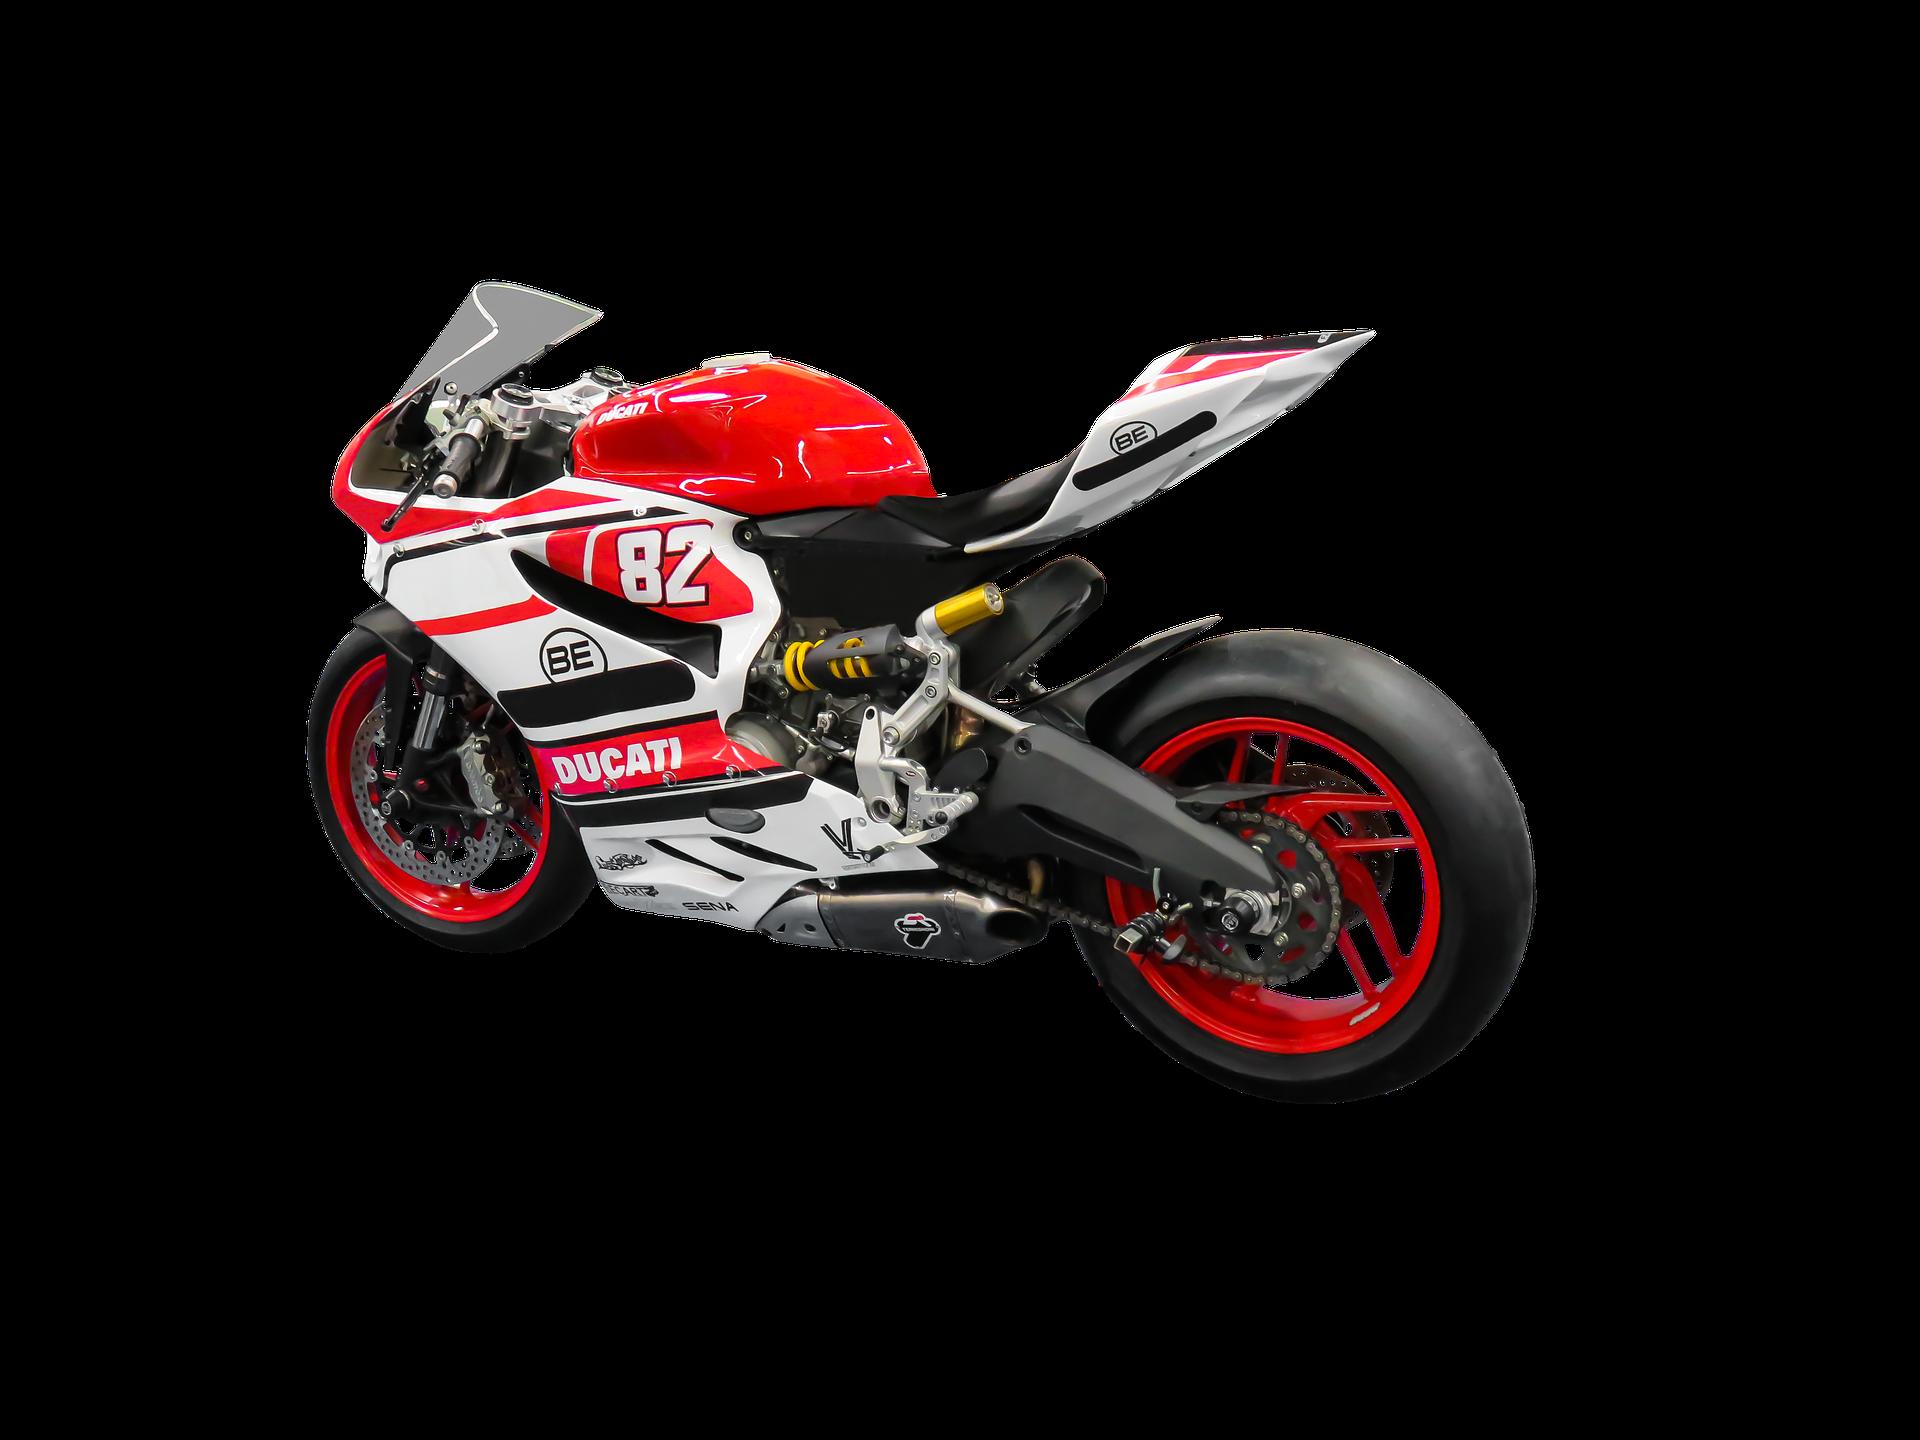 Ducati Bike, Bike, Motorcycle, Race, Sport, HQ Photo